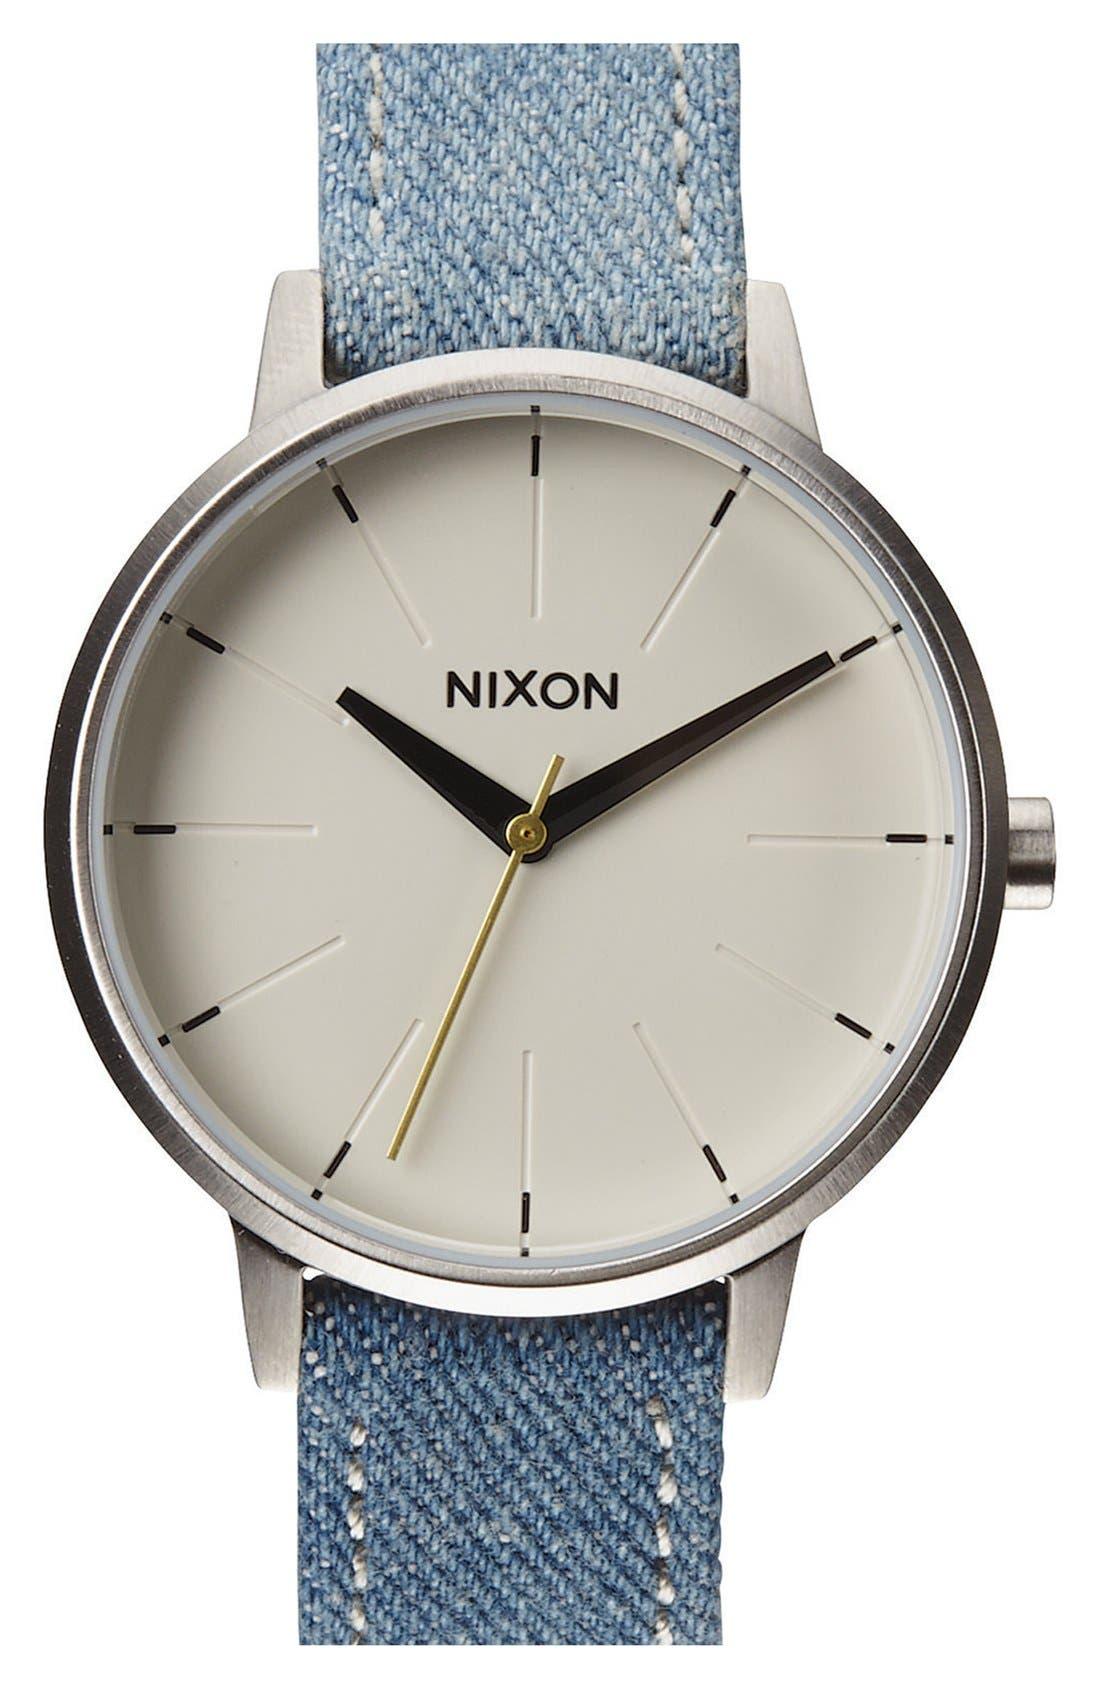 Main Image - Nixon 'The Kensington' Denim Strap Watch, 37mm